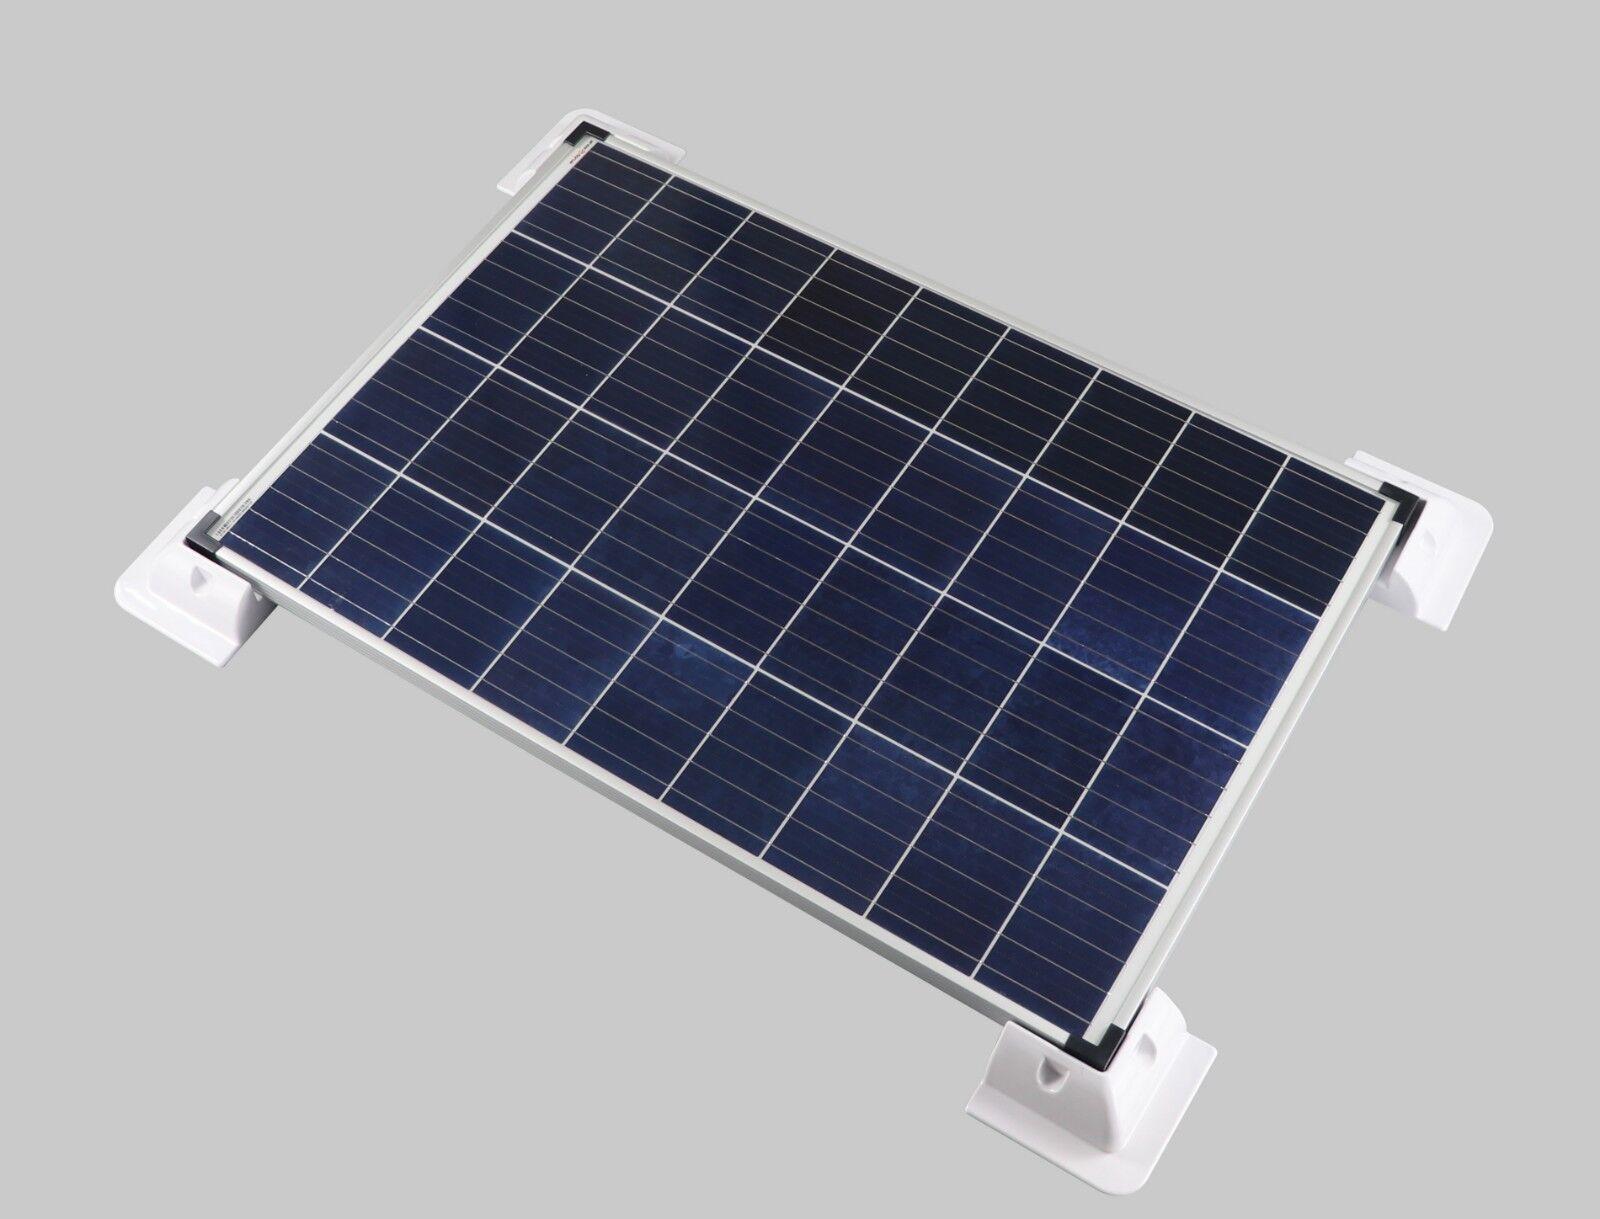 1a-innovation Inselanlage Solaranlage 100 Watt Solarpanel Photovoltaik Pforzheim Solartechnik